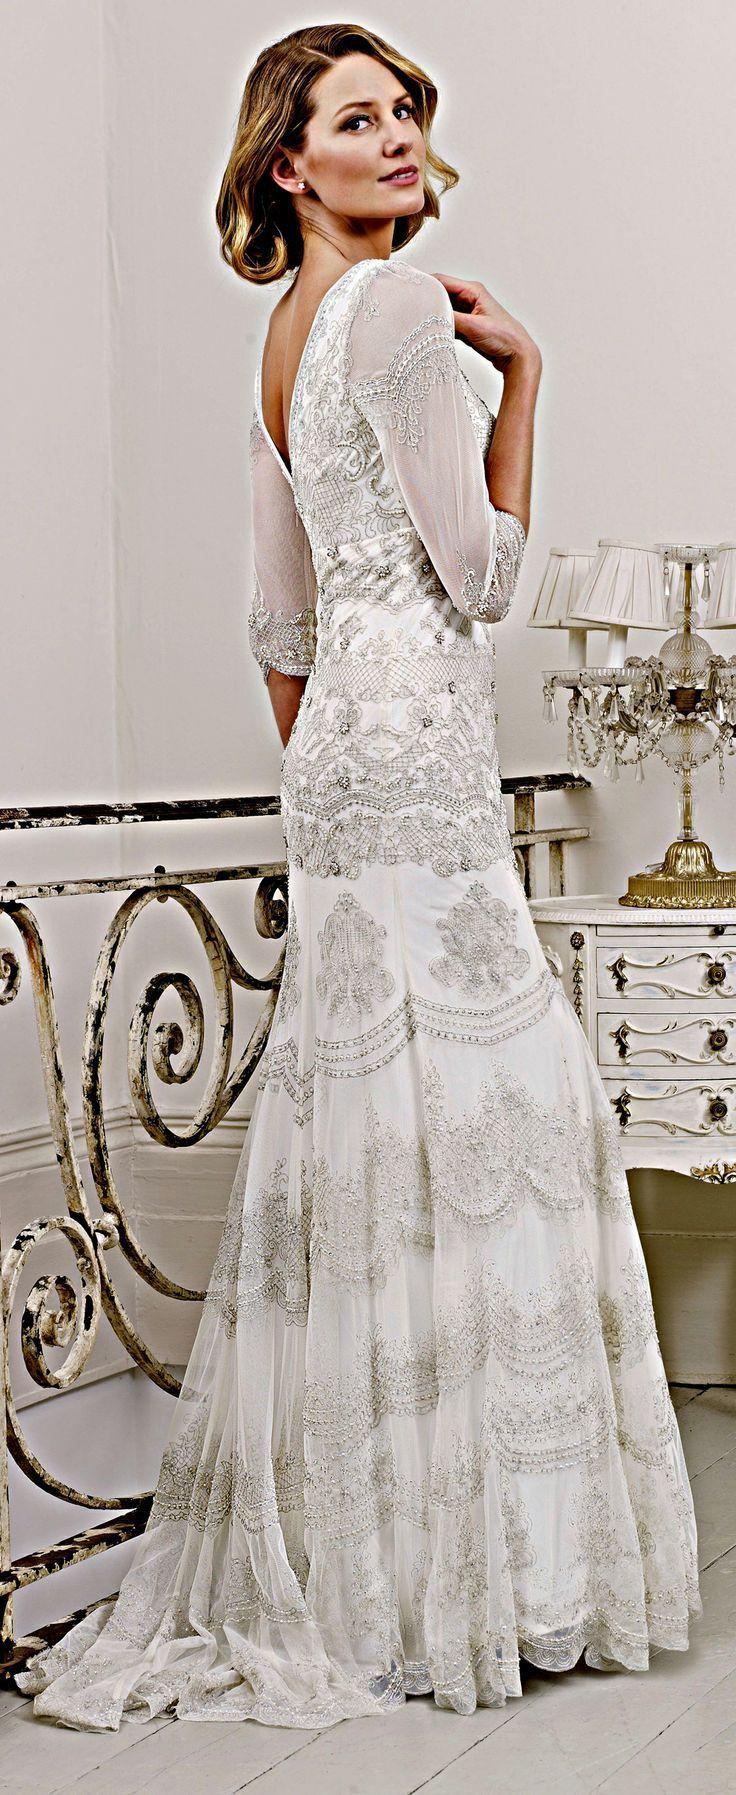 169196558852 17 Best ideas about Older Bride on Pinterest